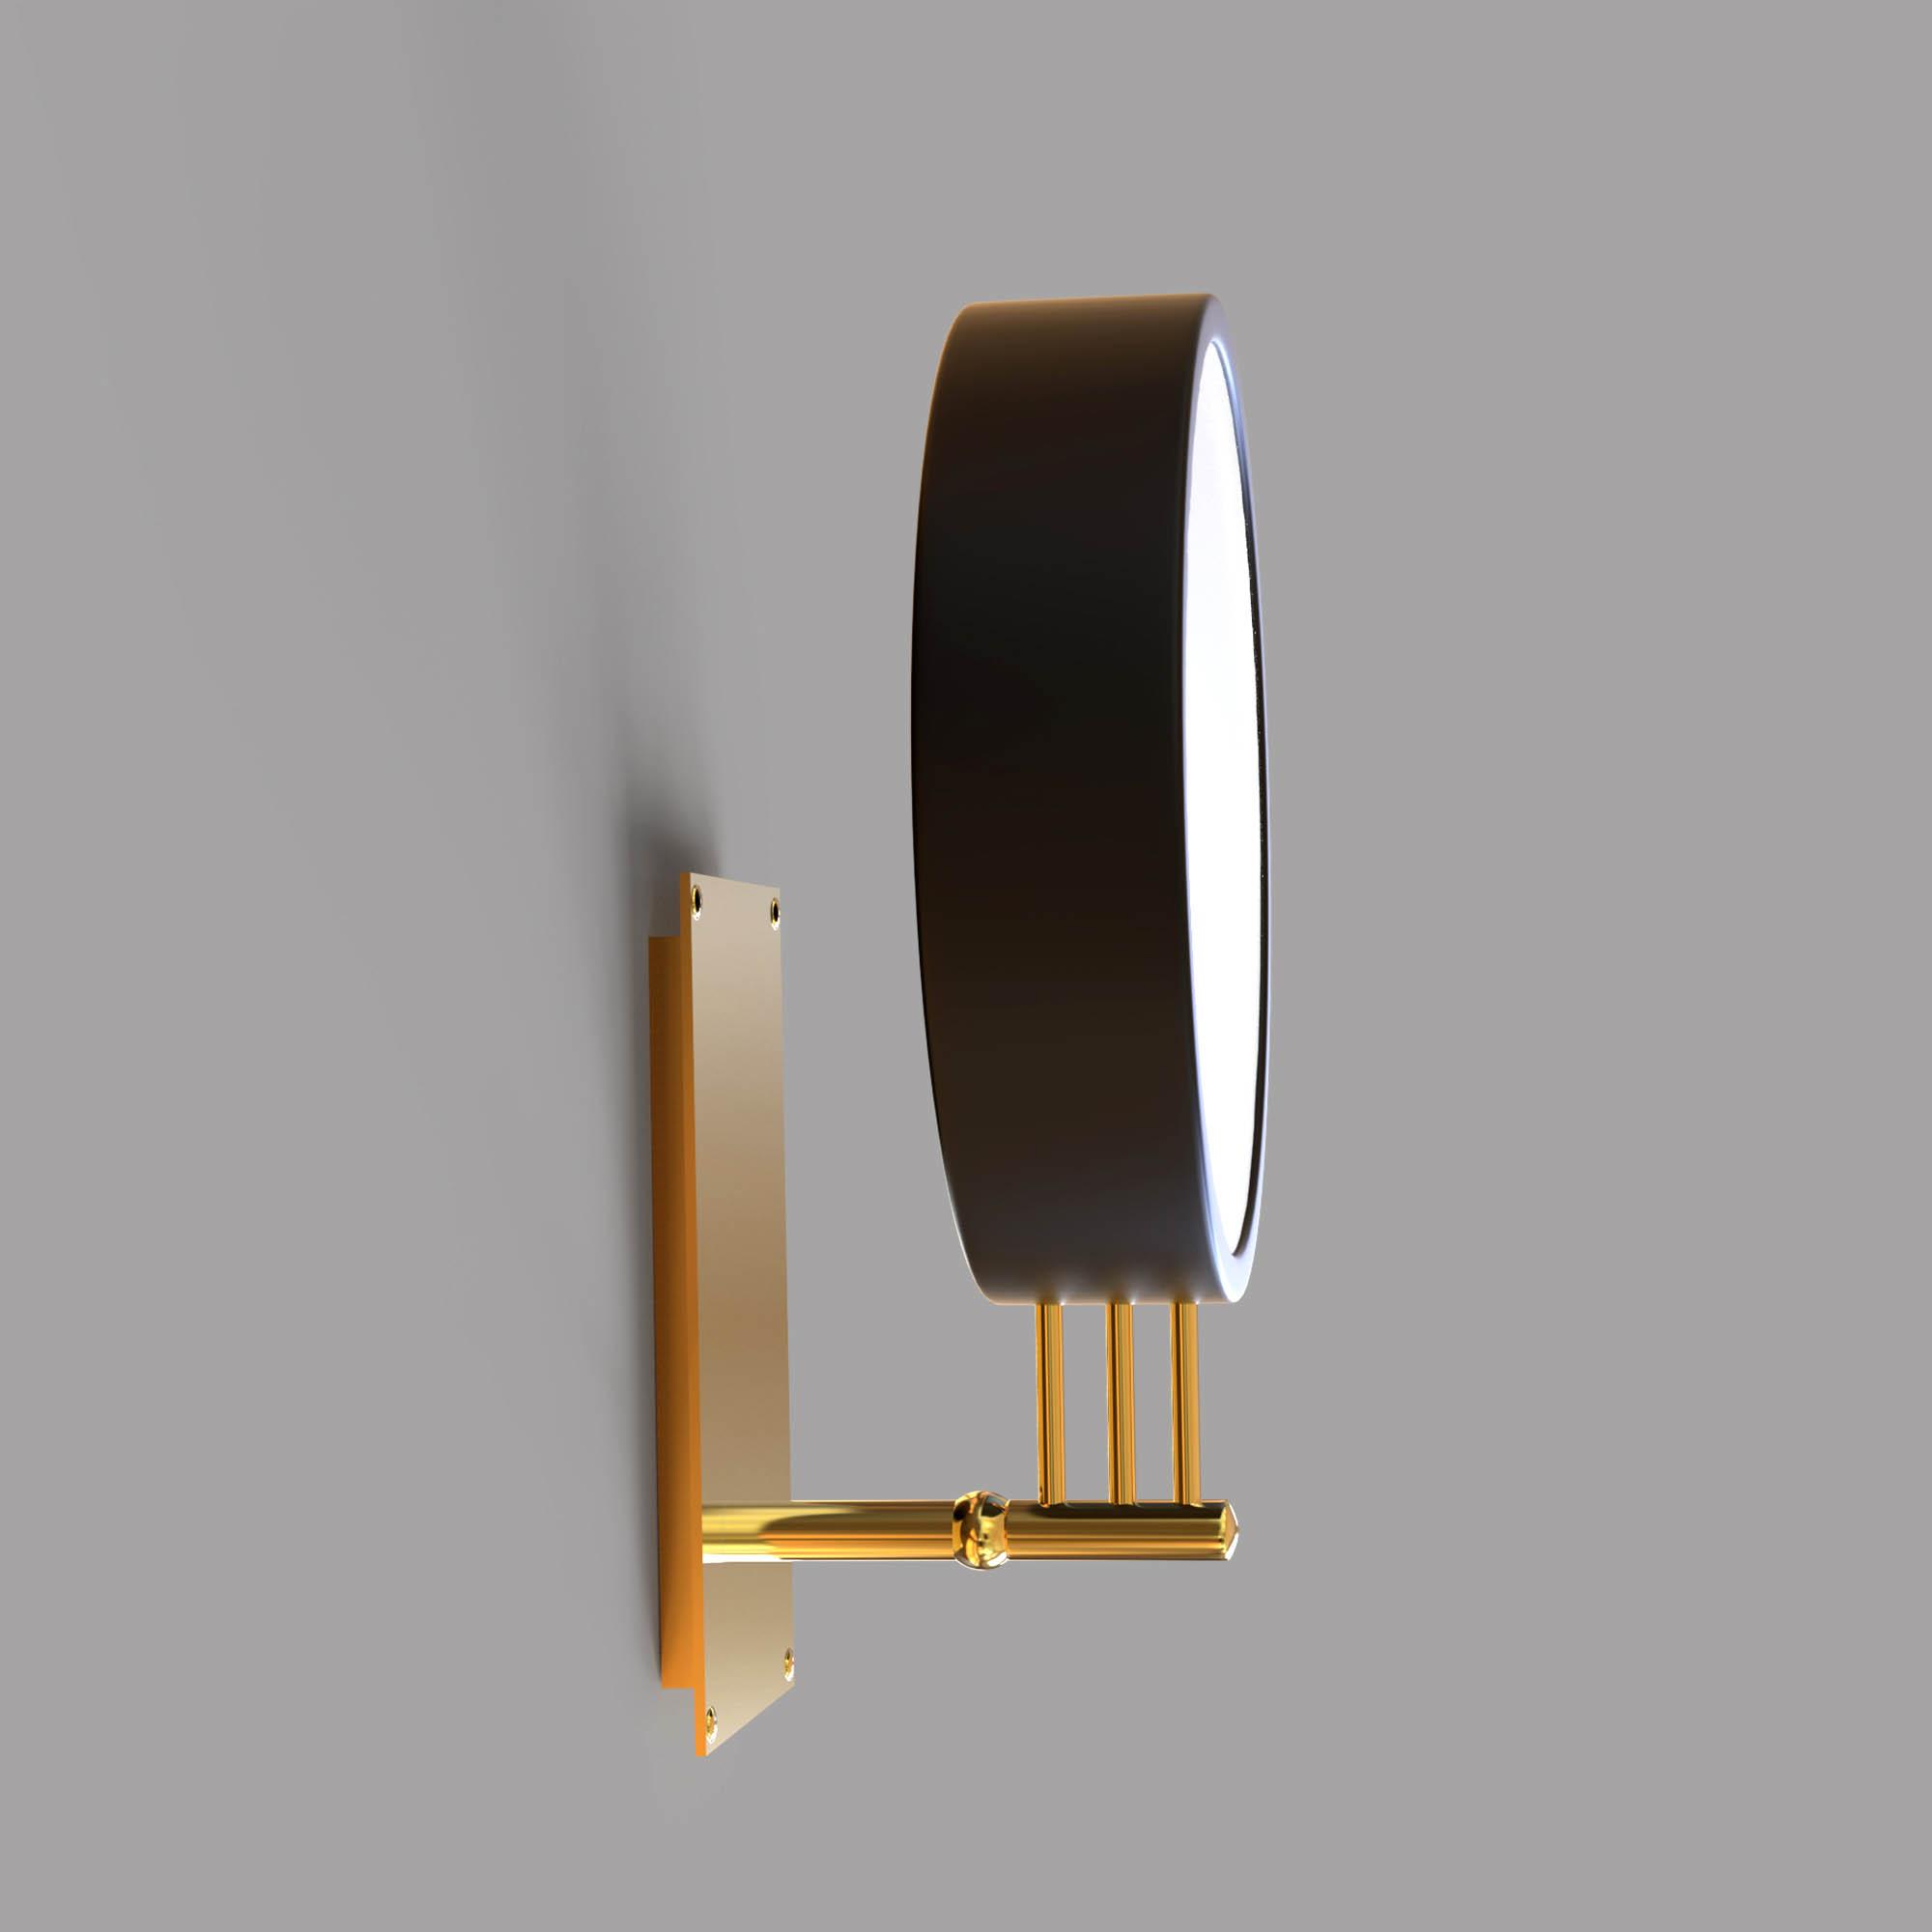 Round Minimalist Elegant Golden and Black  Lamp - 3D Model